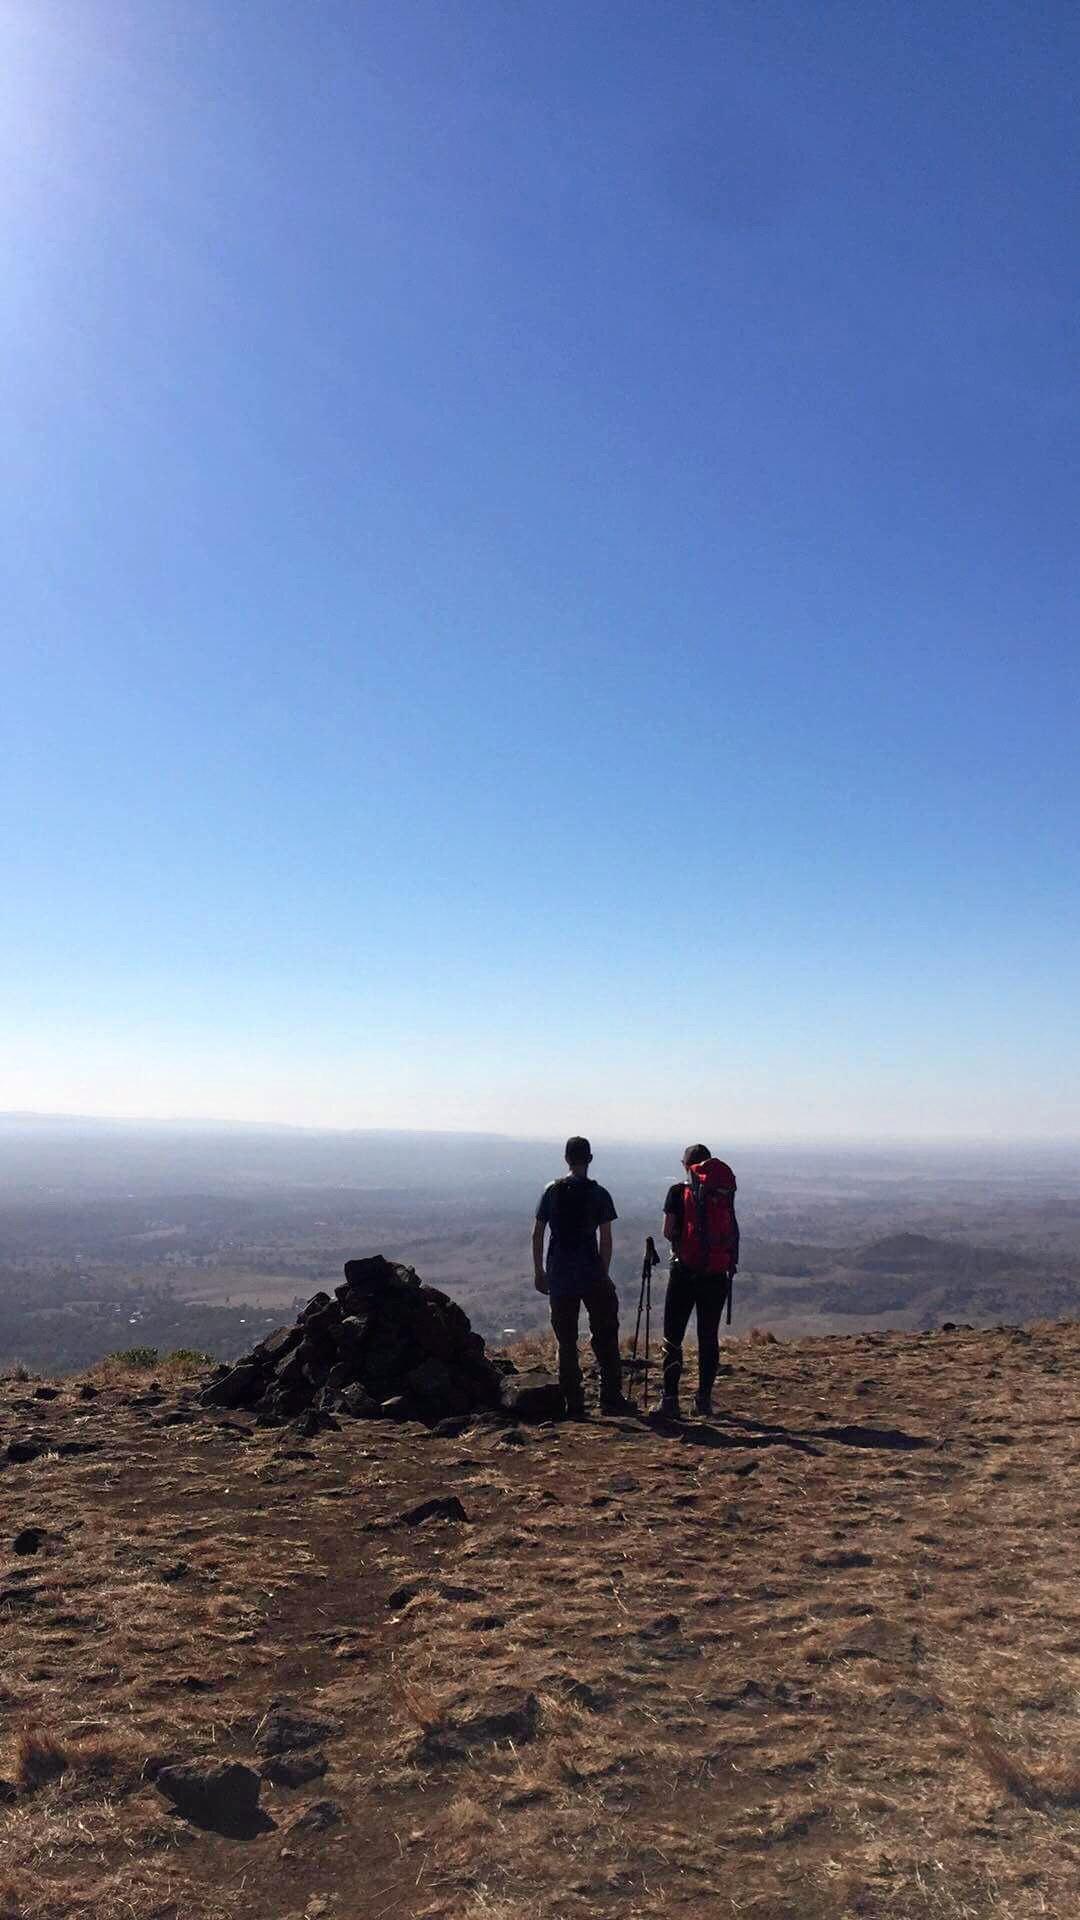 Juanita Anable (37) and Lewis Bell (17) of Rosewood will walk Kokoda next month.